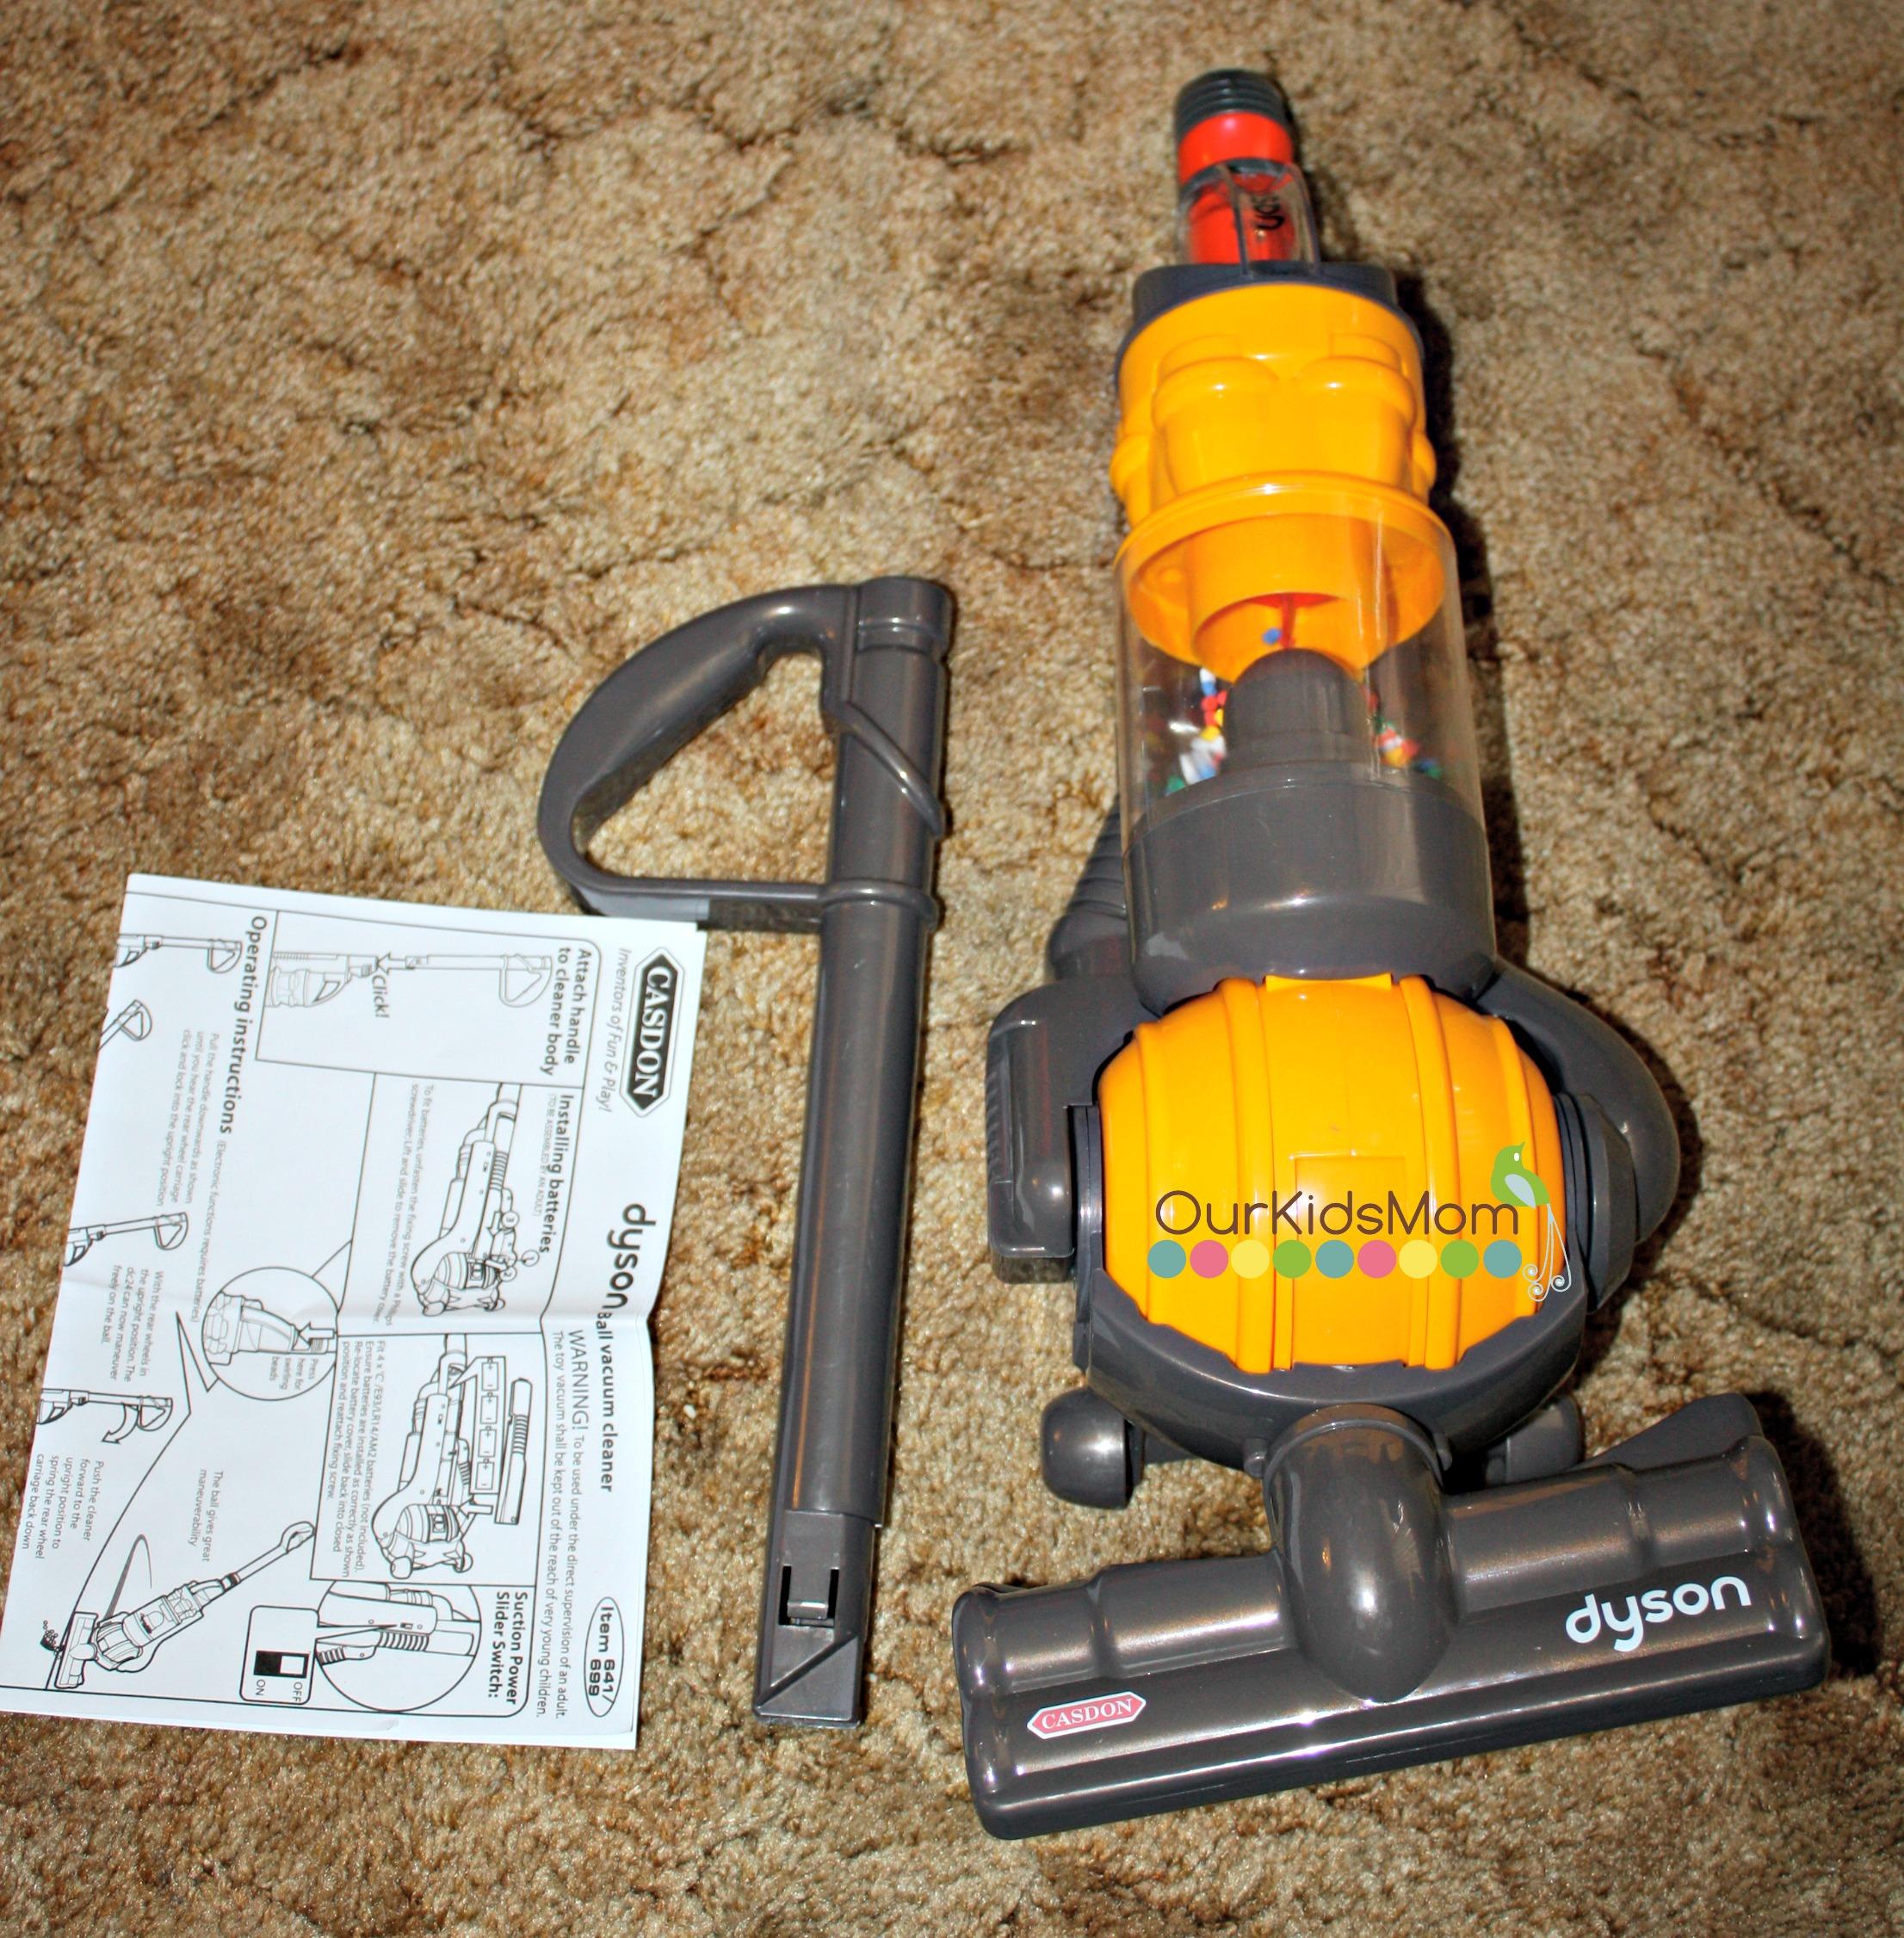 Casdon Toy Dyson Ball Vacuum Cleaner